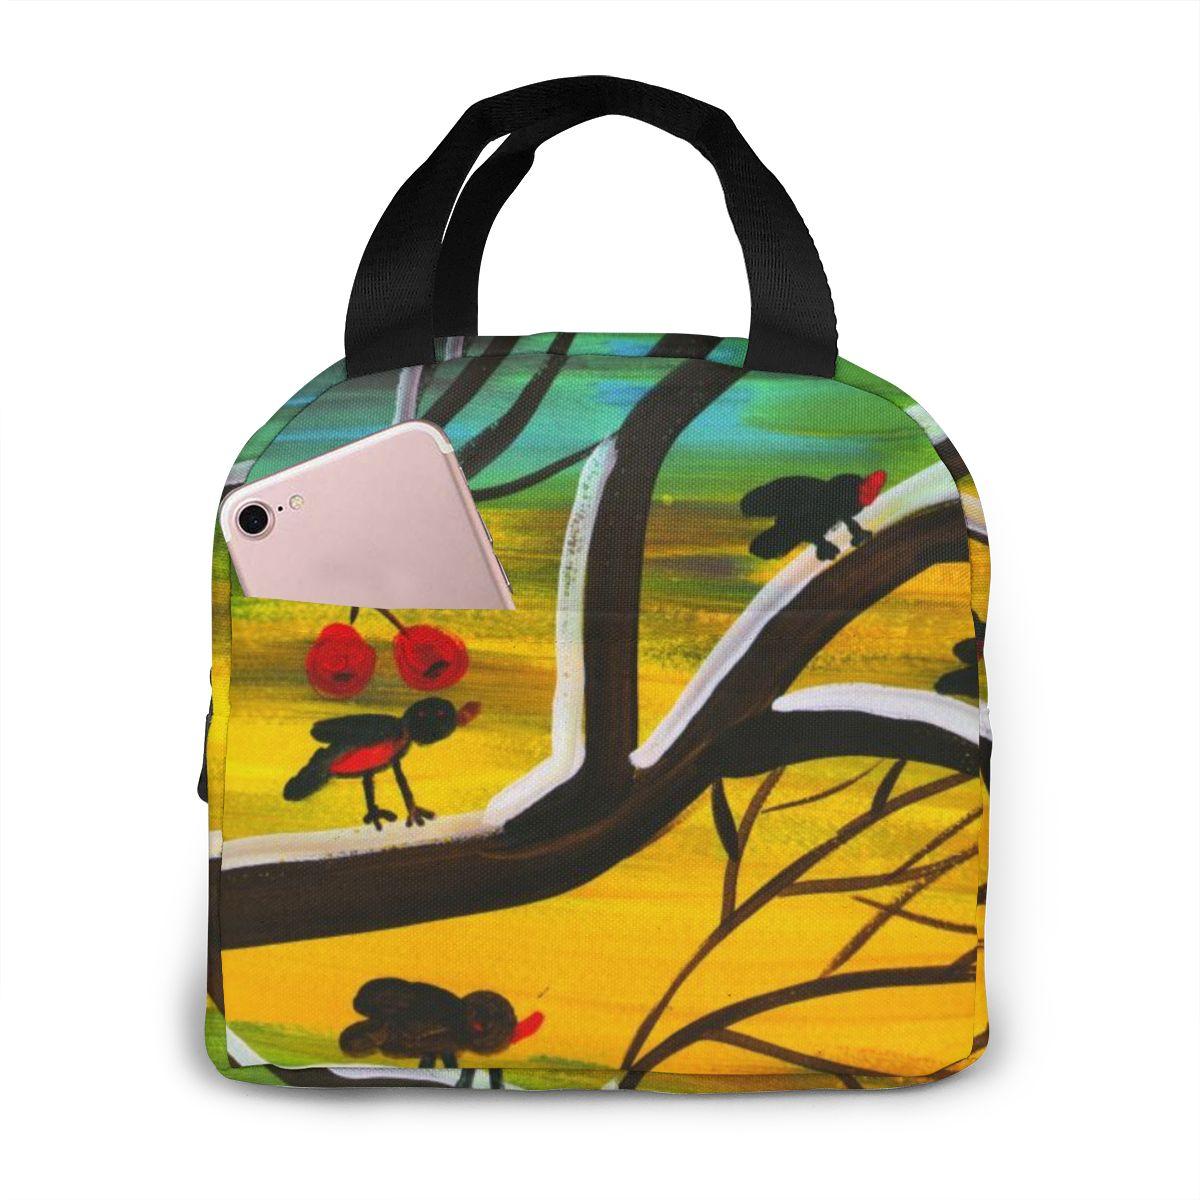 NOISYDESIGNS Paquete de aislamiento Totebag lonchbox pintura pájaro cereza personalizado enfriador térmico bolsa aislante para mujeres